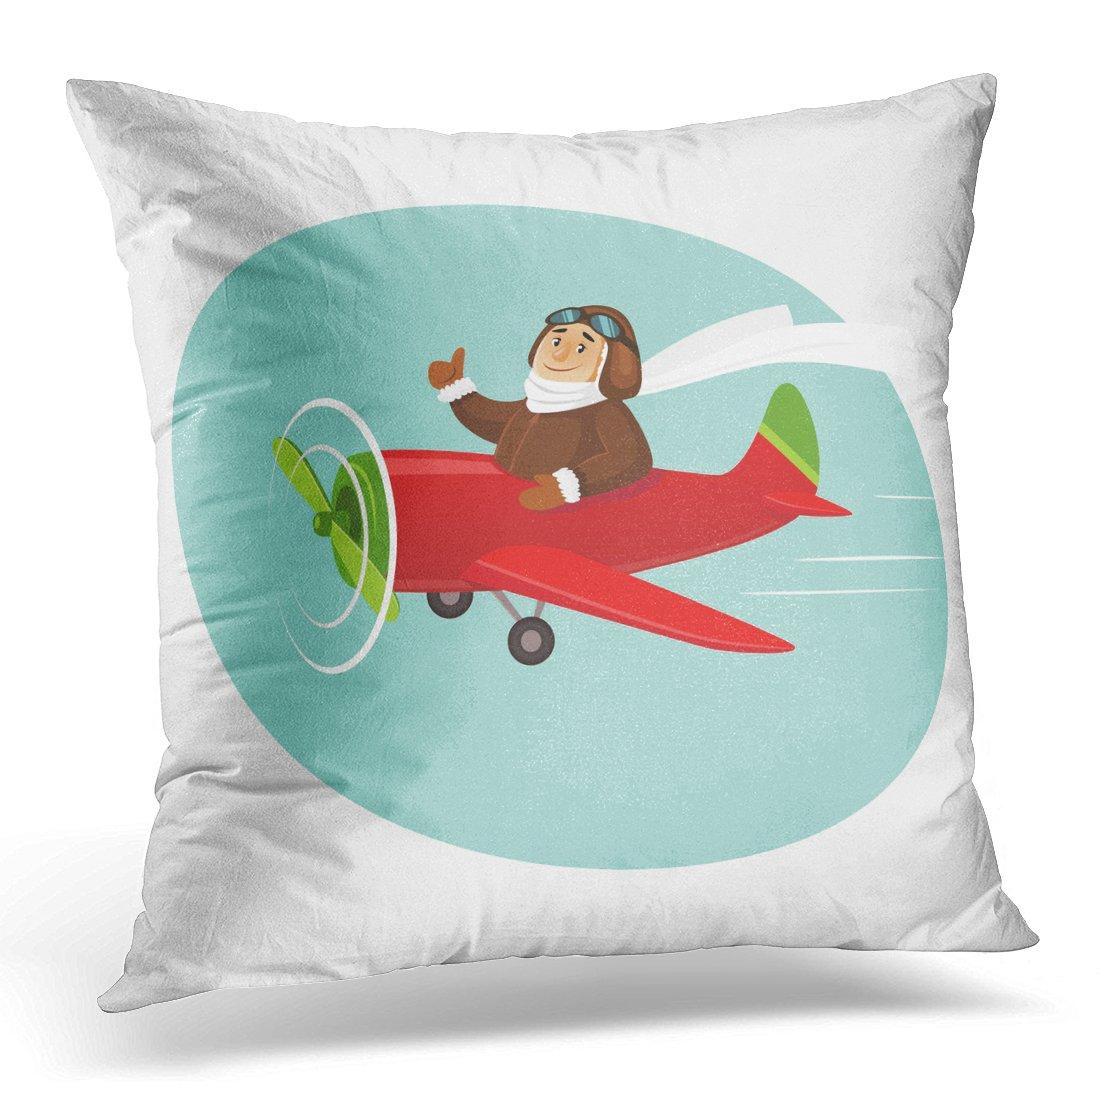 "/'US Pilot/' Design 16/"" x 16/"" Square Cushion Cover 100/% Cotton"